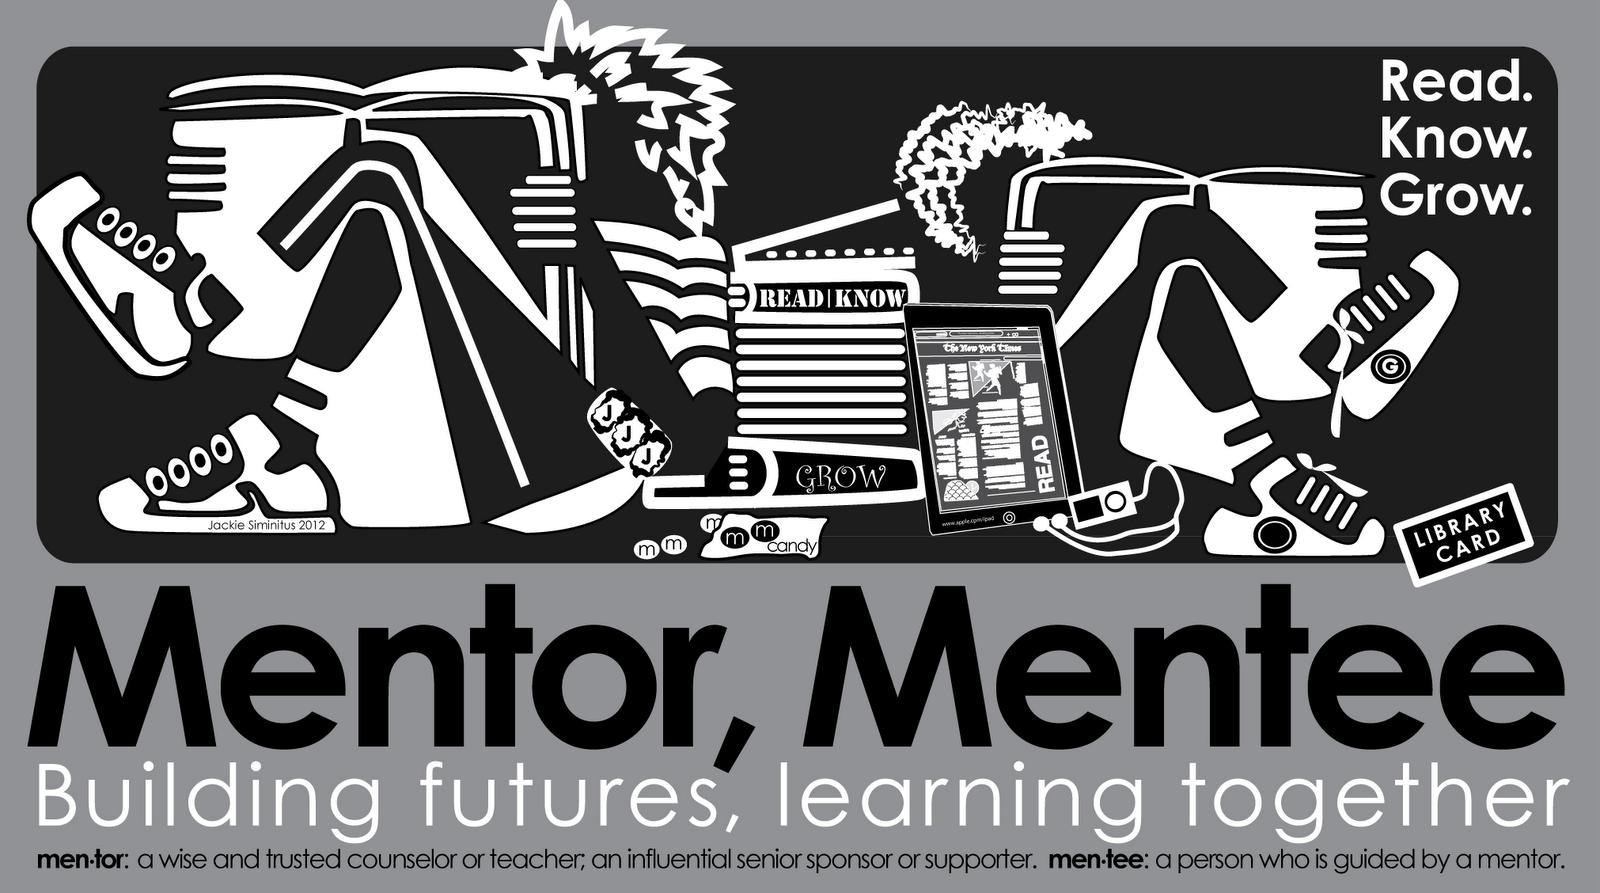 peer mentoring quotes relationship